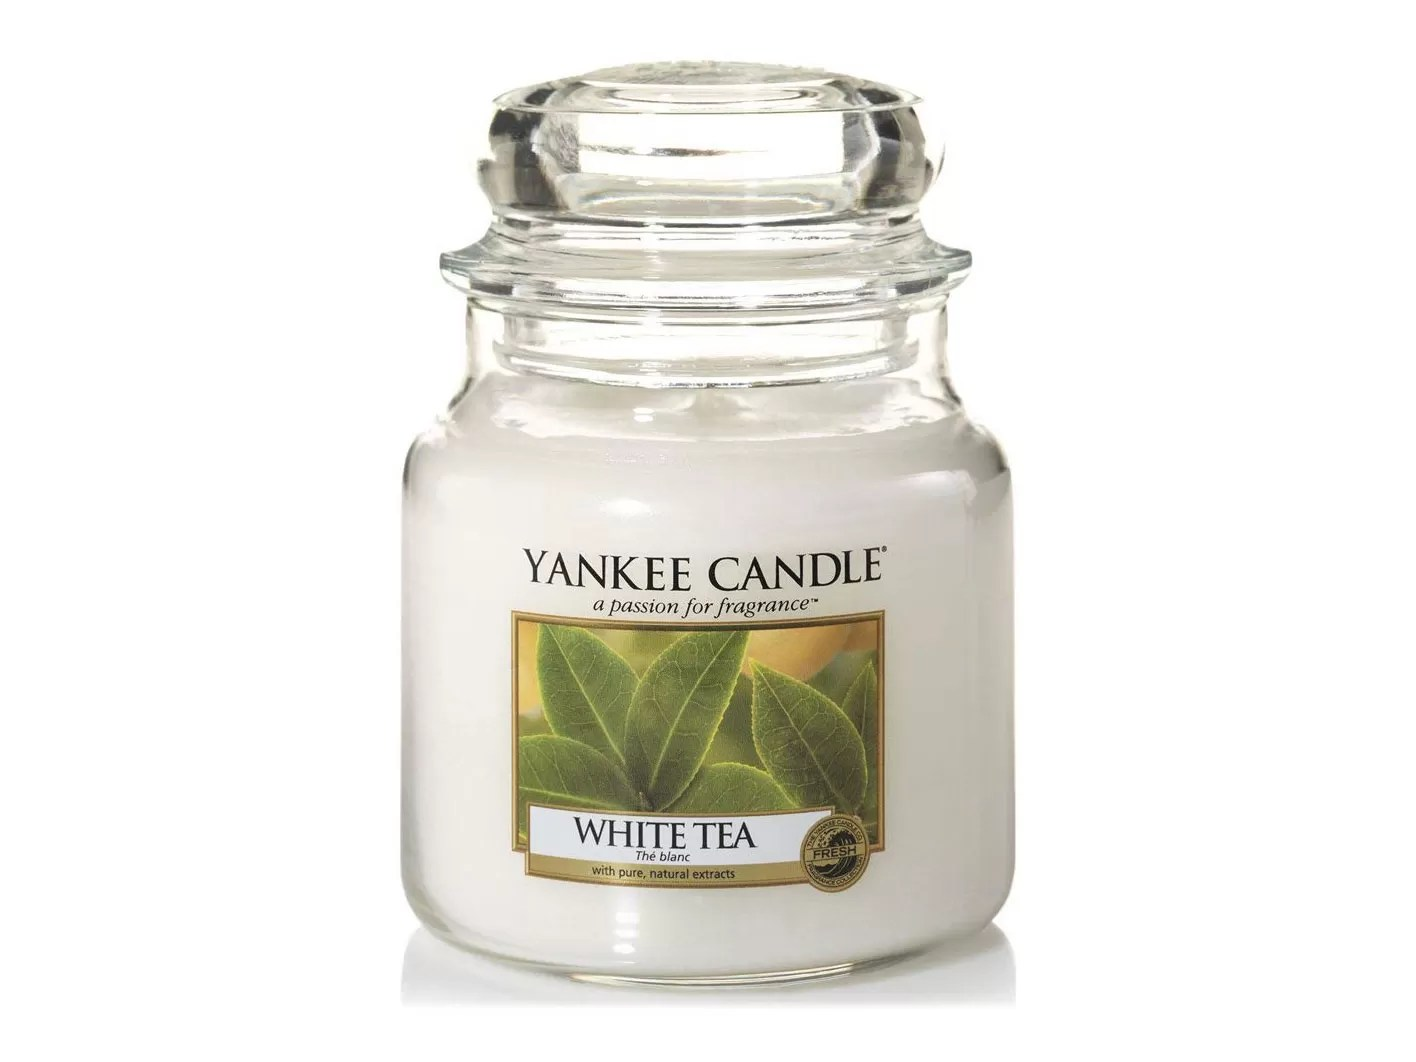 regali per amanti del tè - candela profumata yankee candle